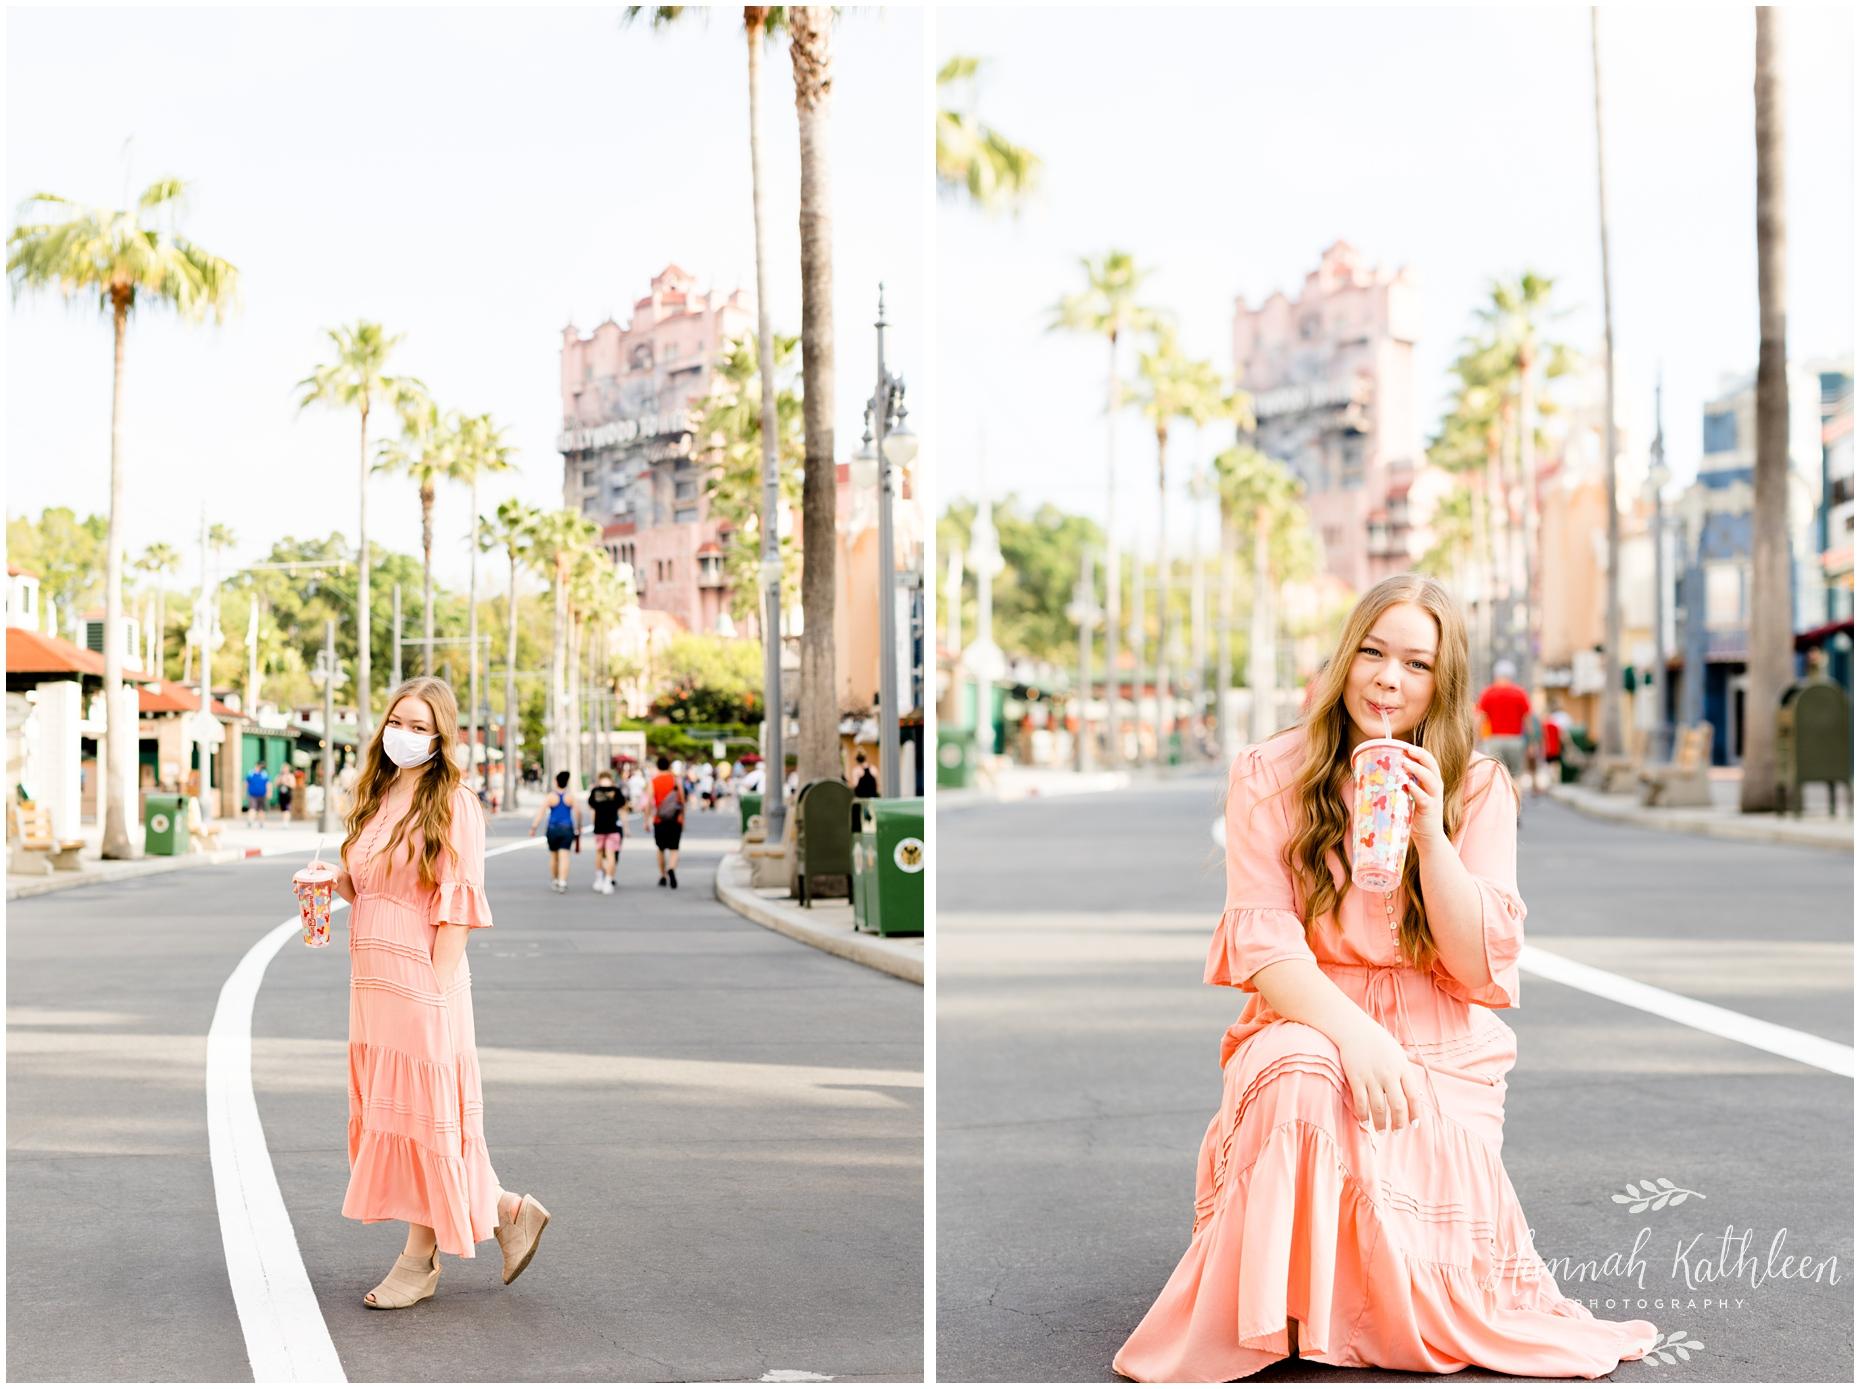 lucy_oyama_photography_senior_photos_disney_world_hollywood_studios_portraits_parks_magic_kingdom_orlando